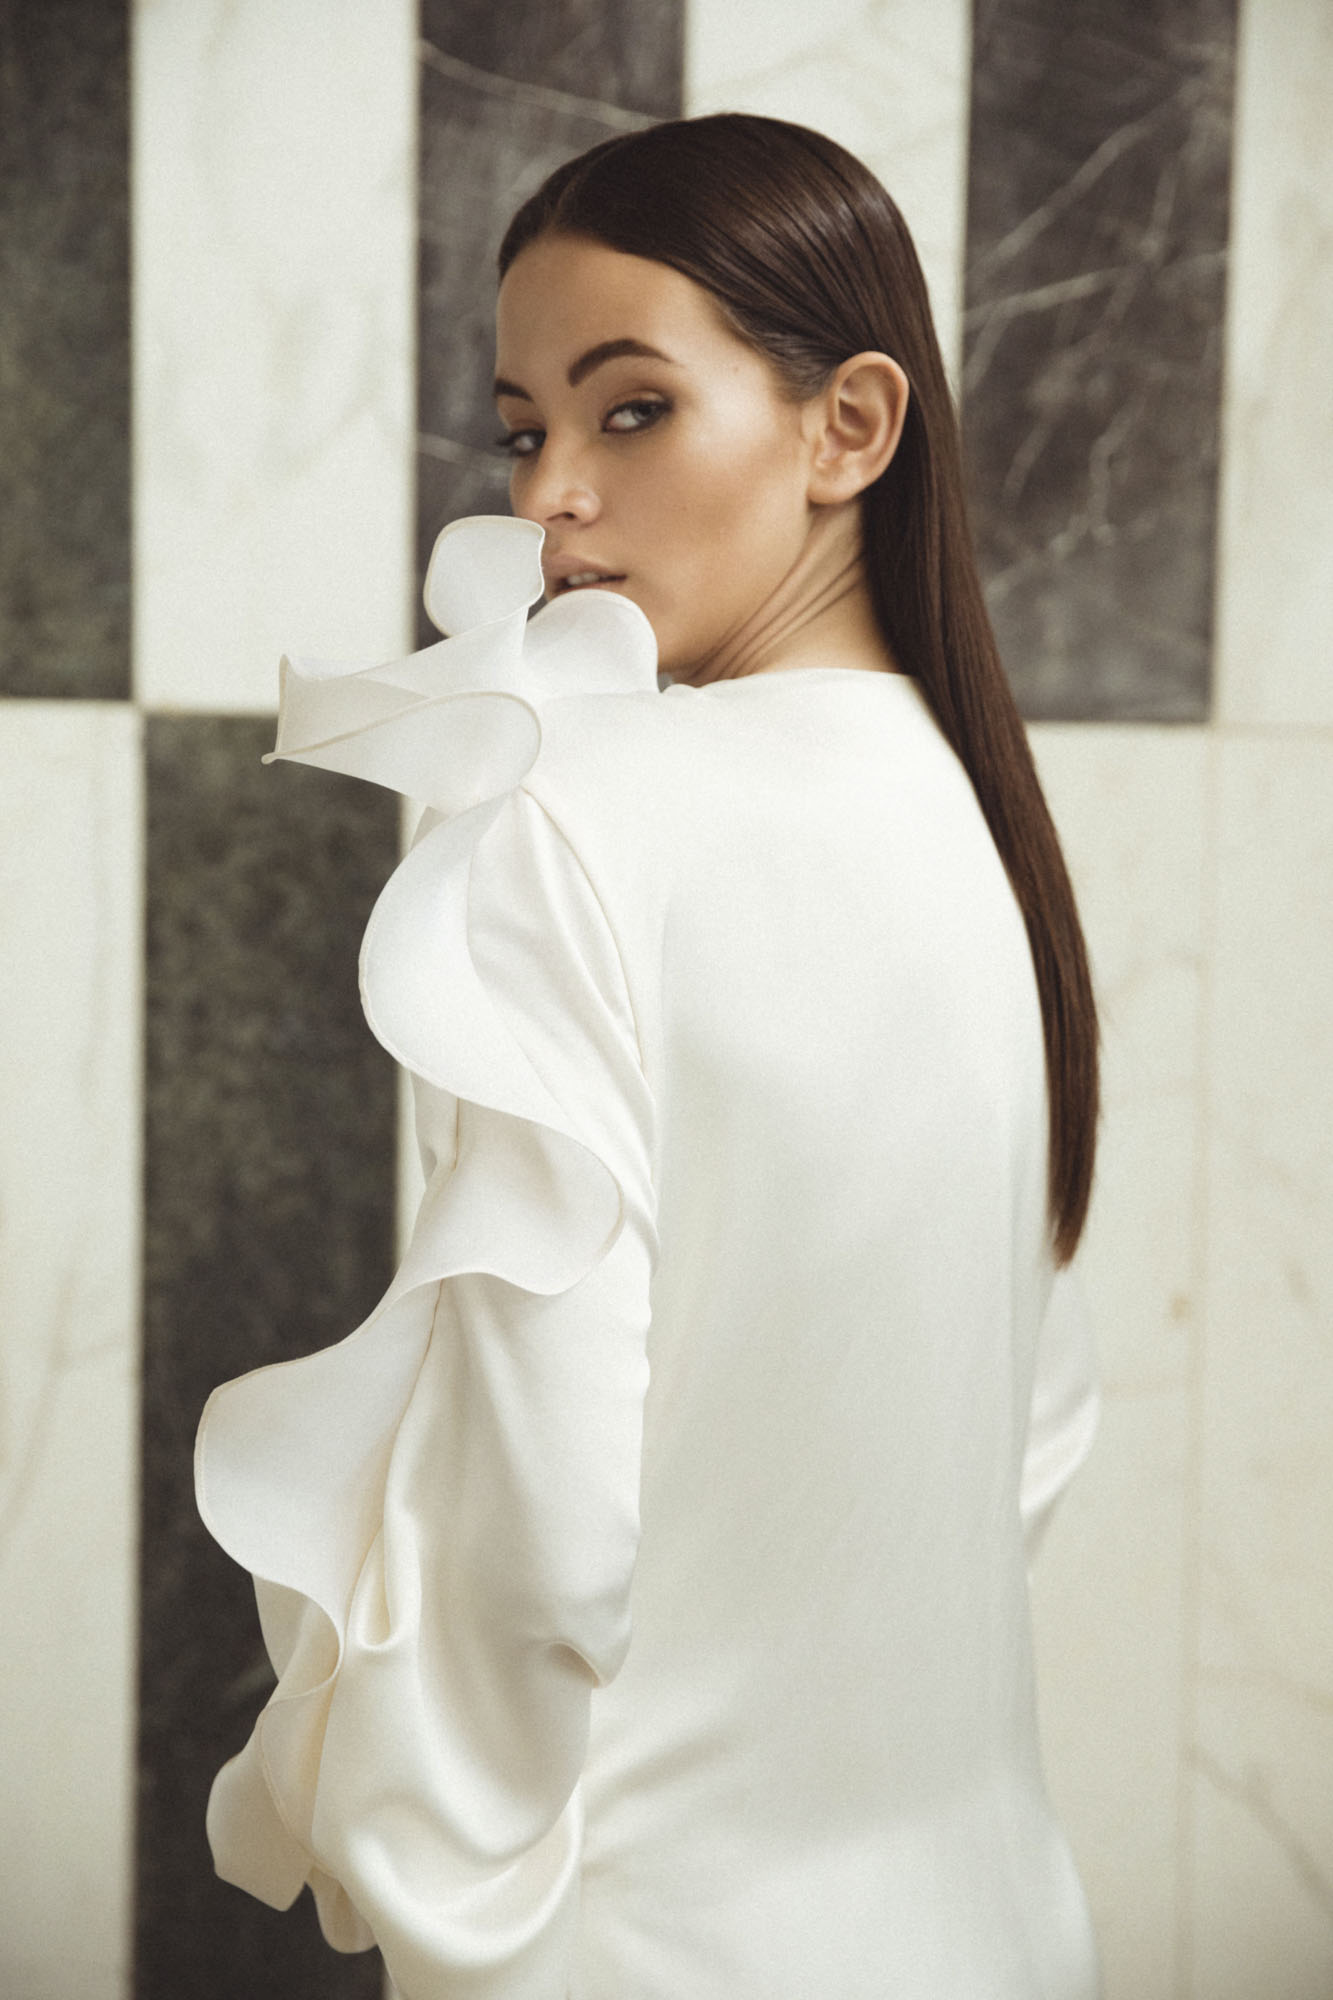 efrain_mogollon_femineus_jane_ dress2.JPG